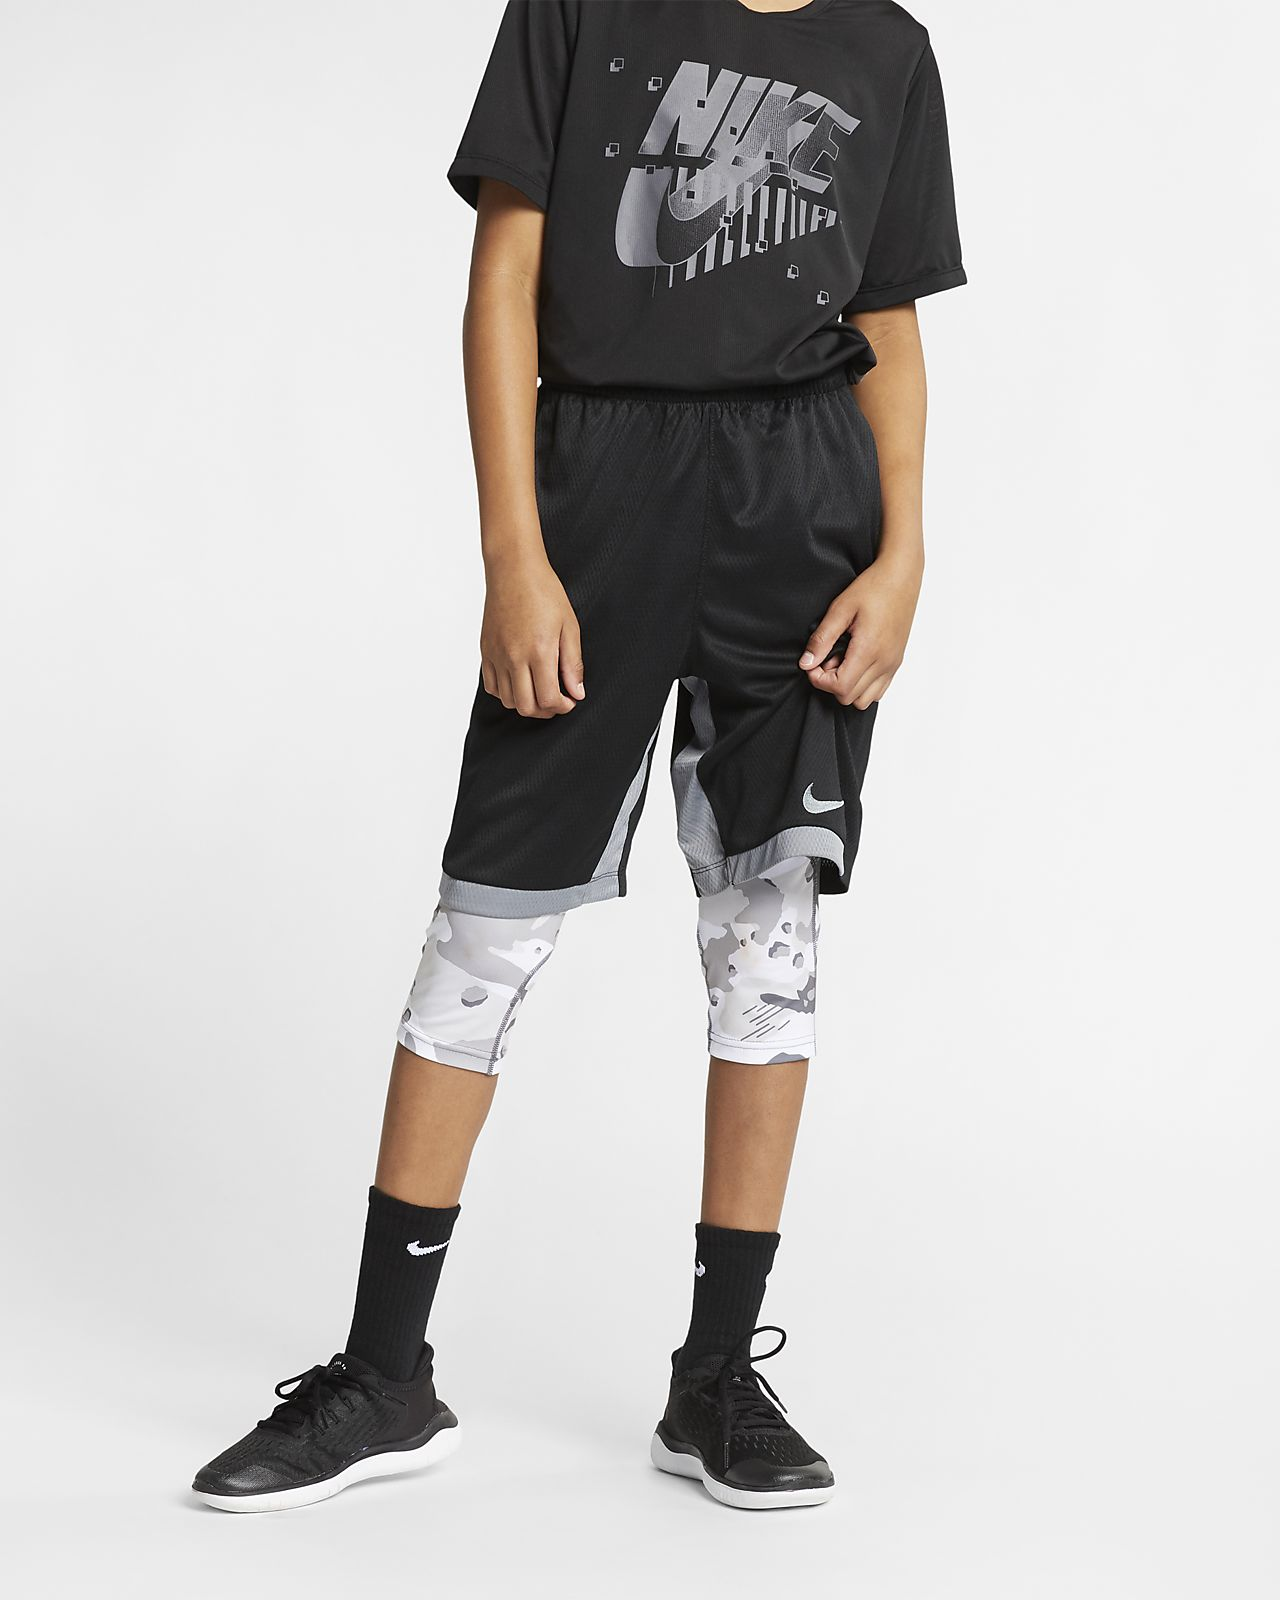 Nike Pro Big Kids' (Boys') 3/4-Length Camo Tights